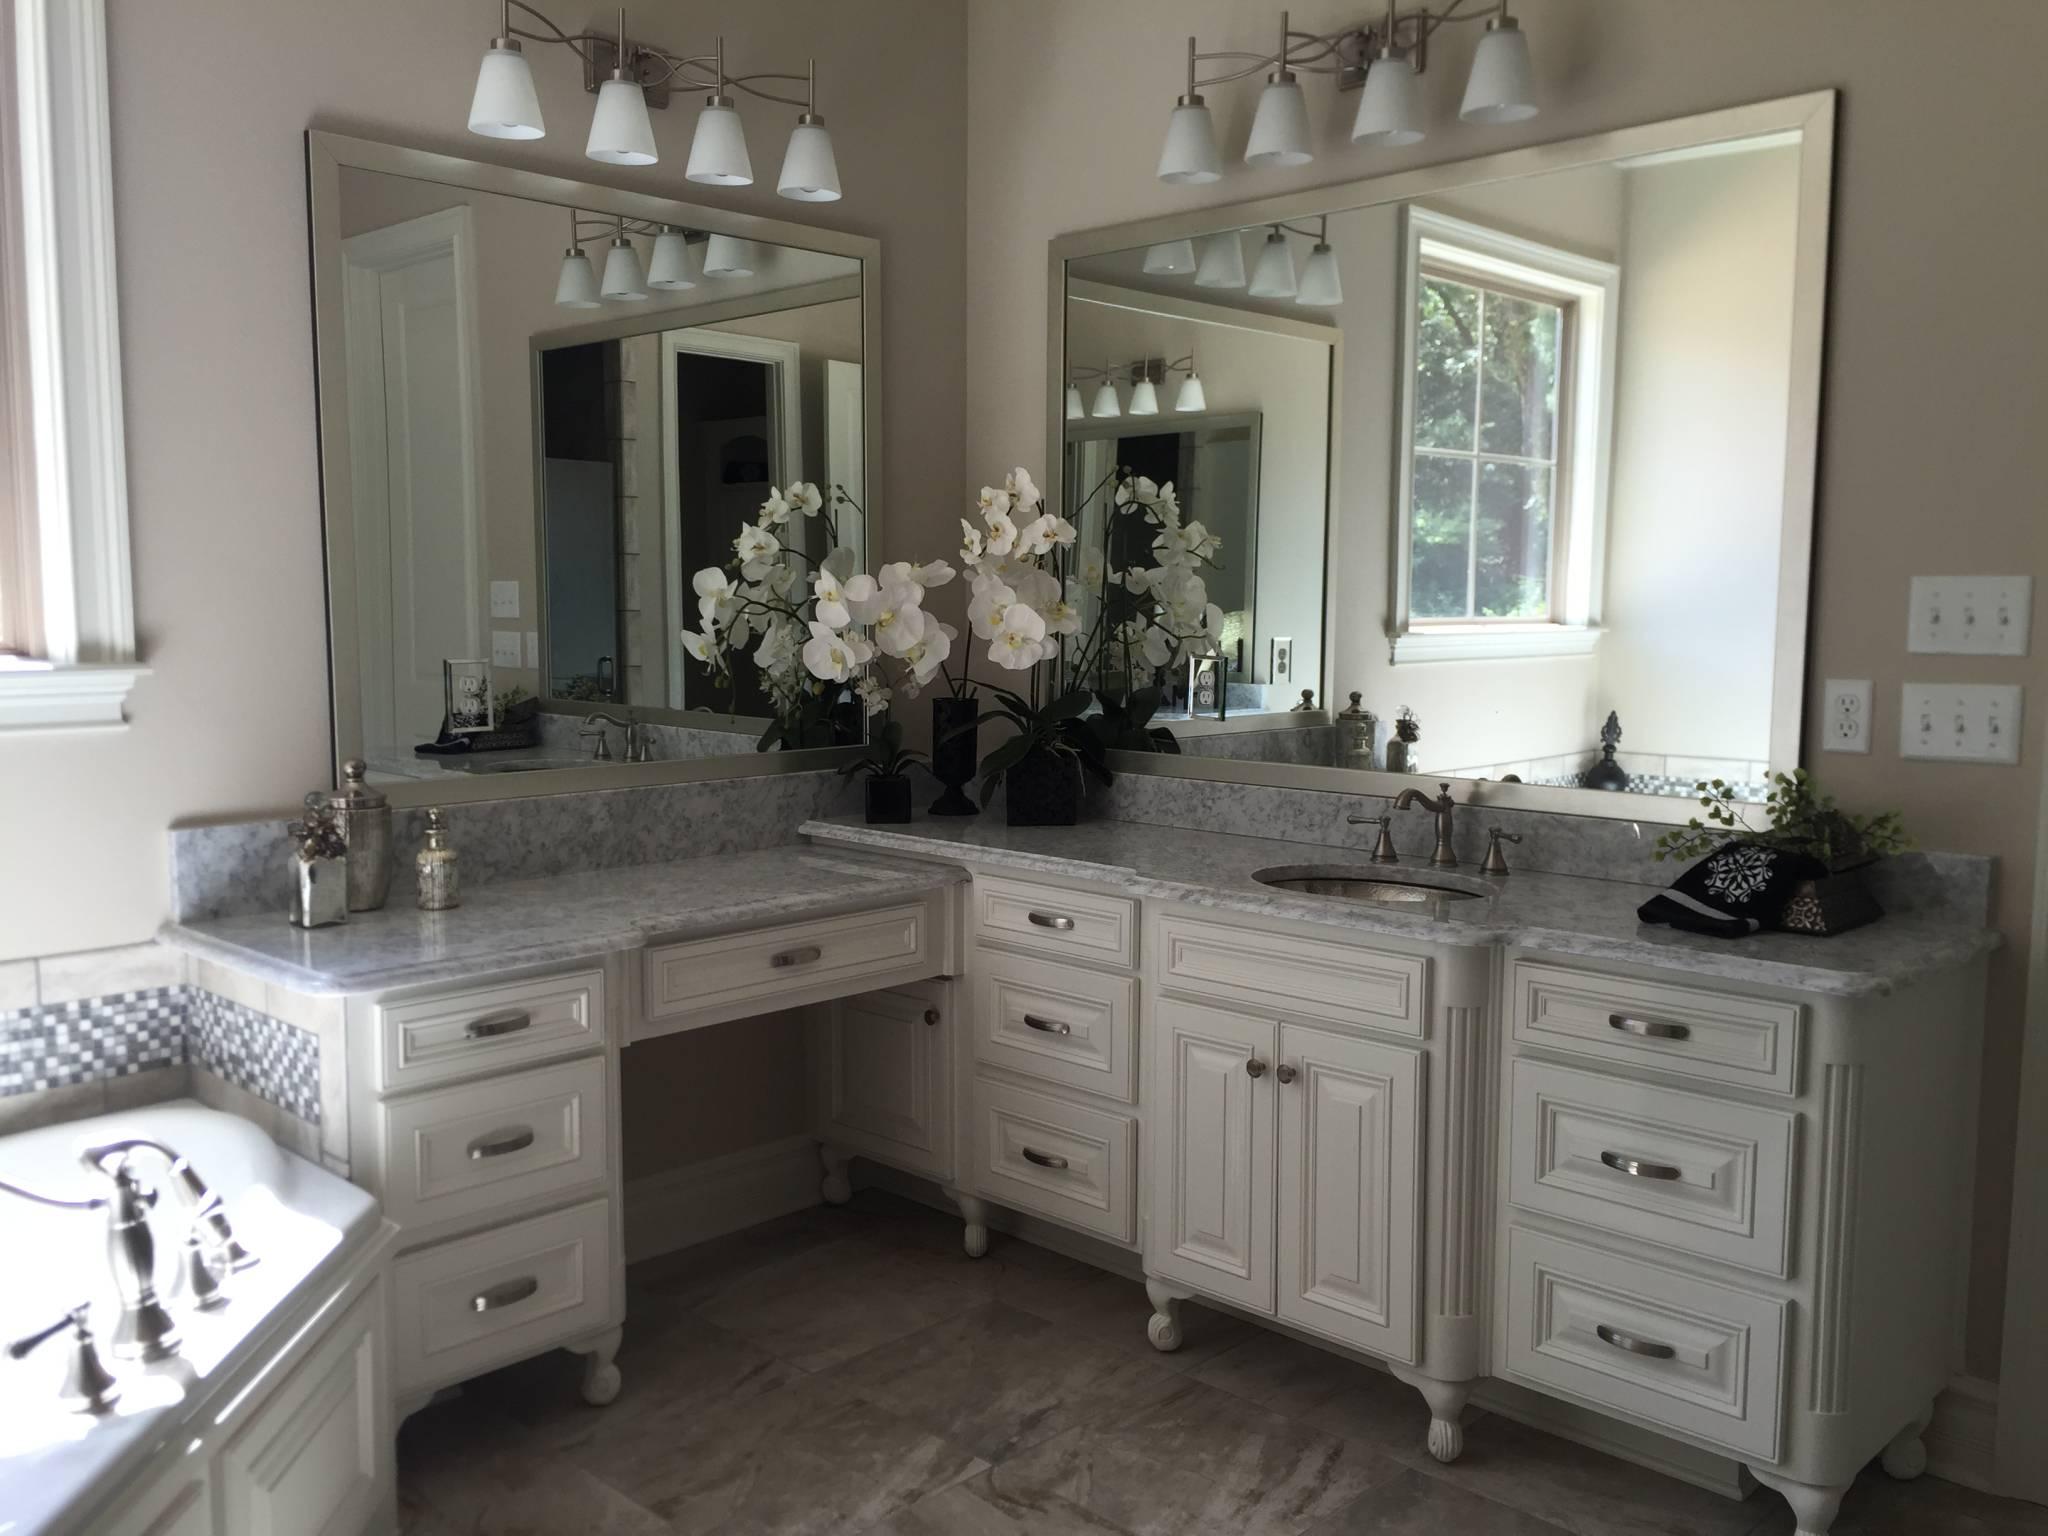 vanities showers baths stone design countertops vanities showers baths